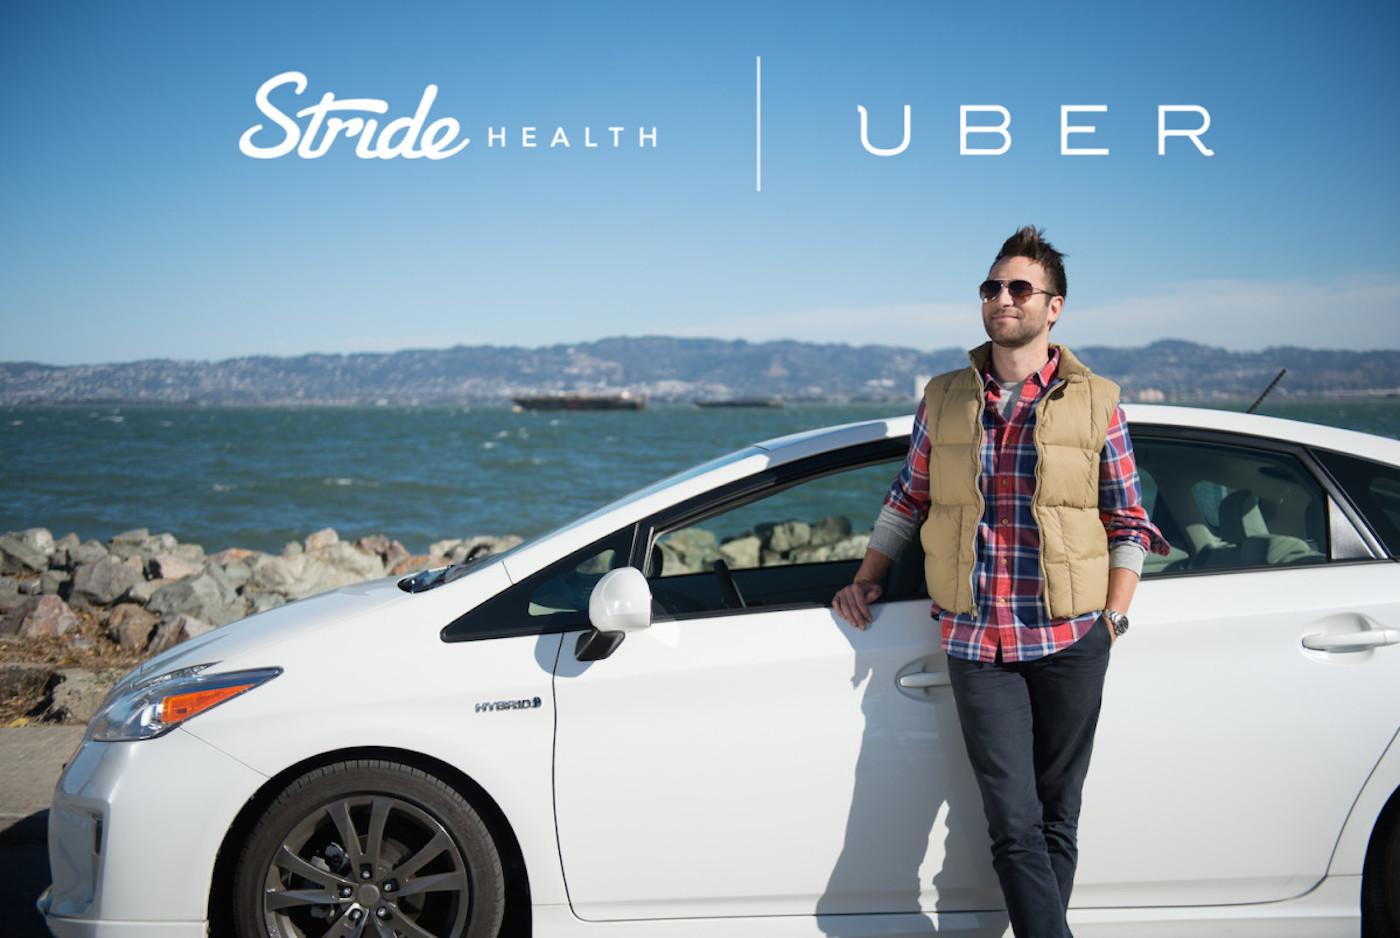 uber stride health